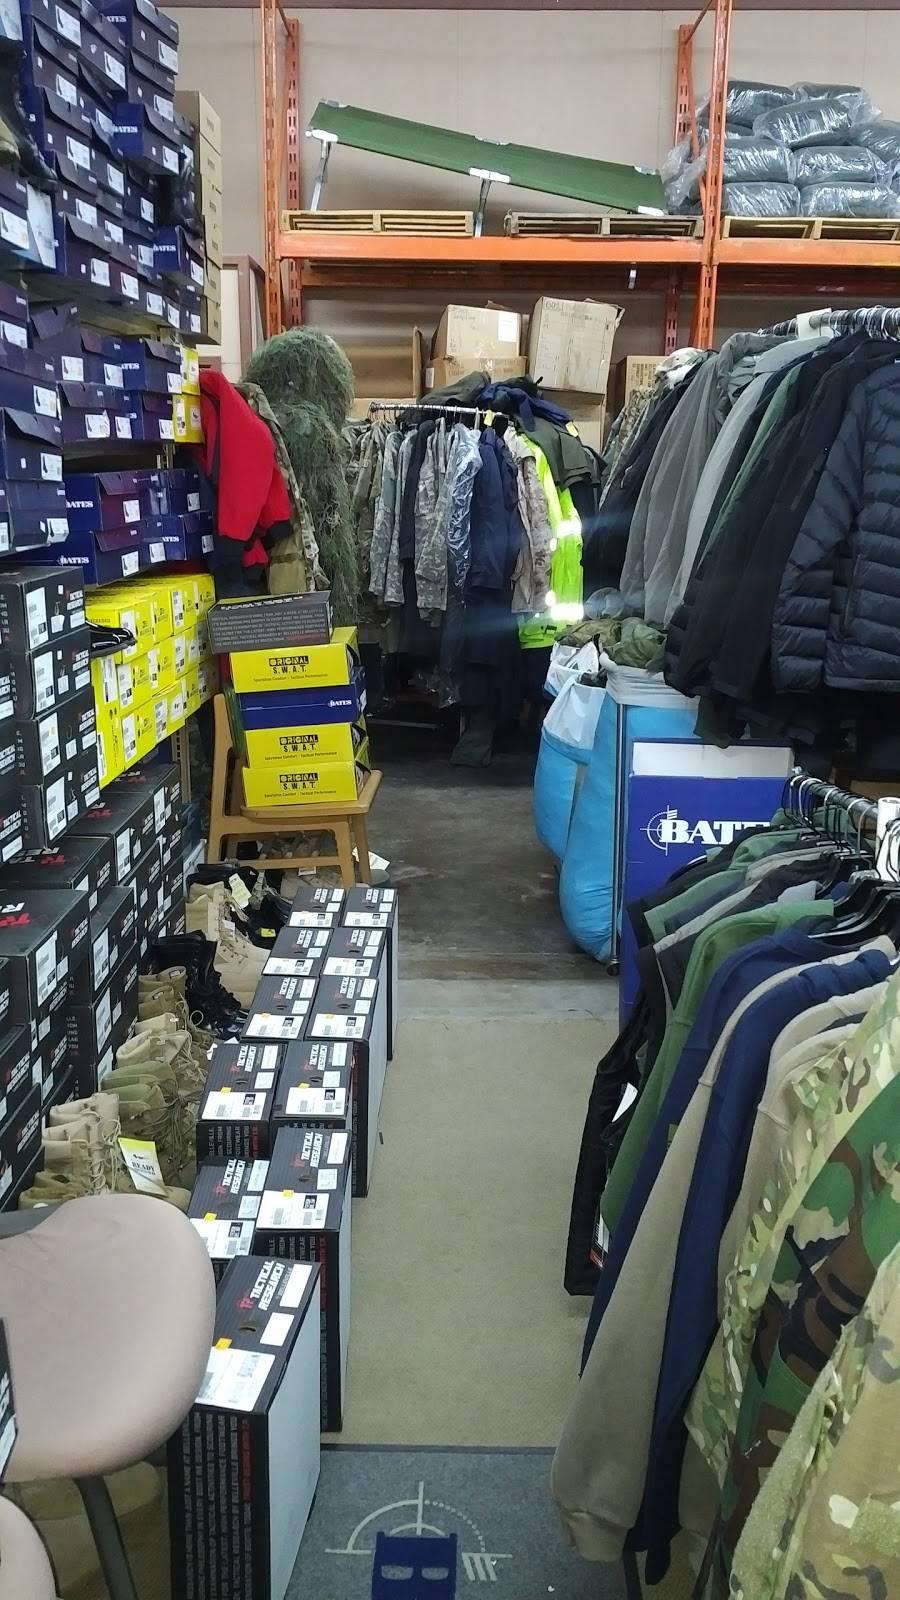 Bosserts Military Surplus - clothing store  | Photo 4 of 7 | Address: 434 NE 32nd St, Kansas City, MO 64116, USA | Phone: (816) 452-2002